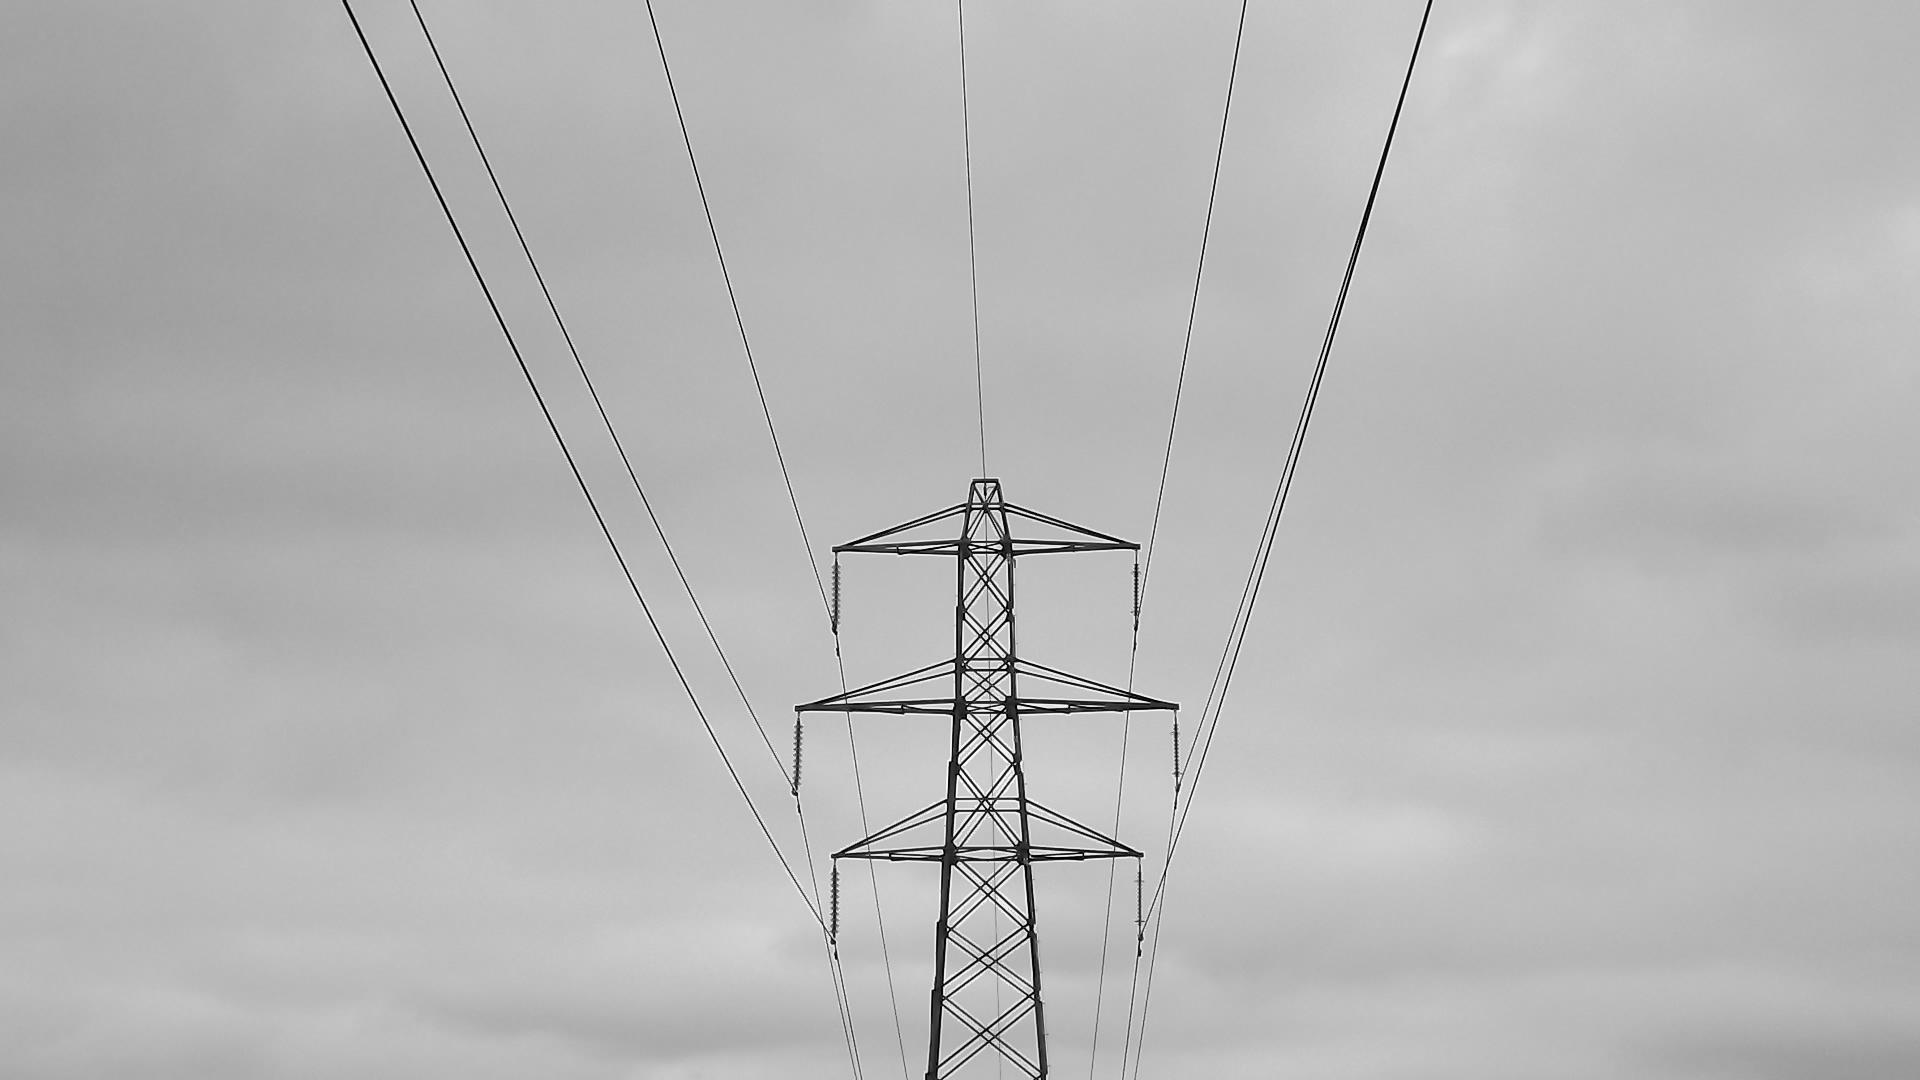 Bulgaria state utility NEK posts record loss in 2013 – report